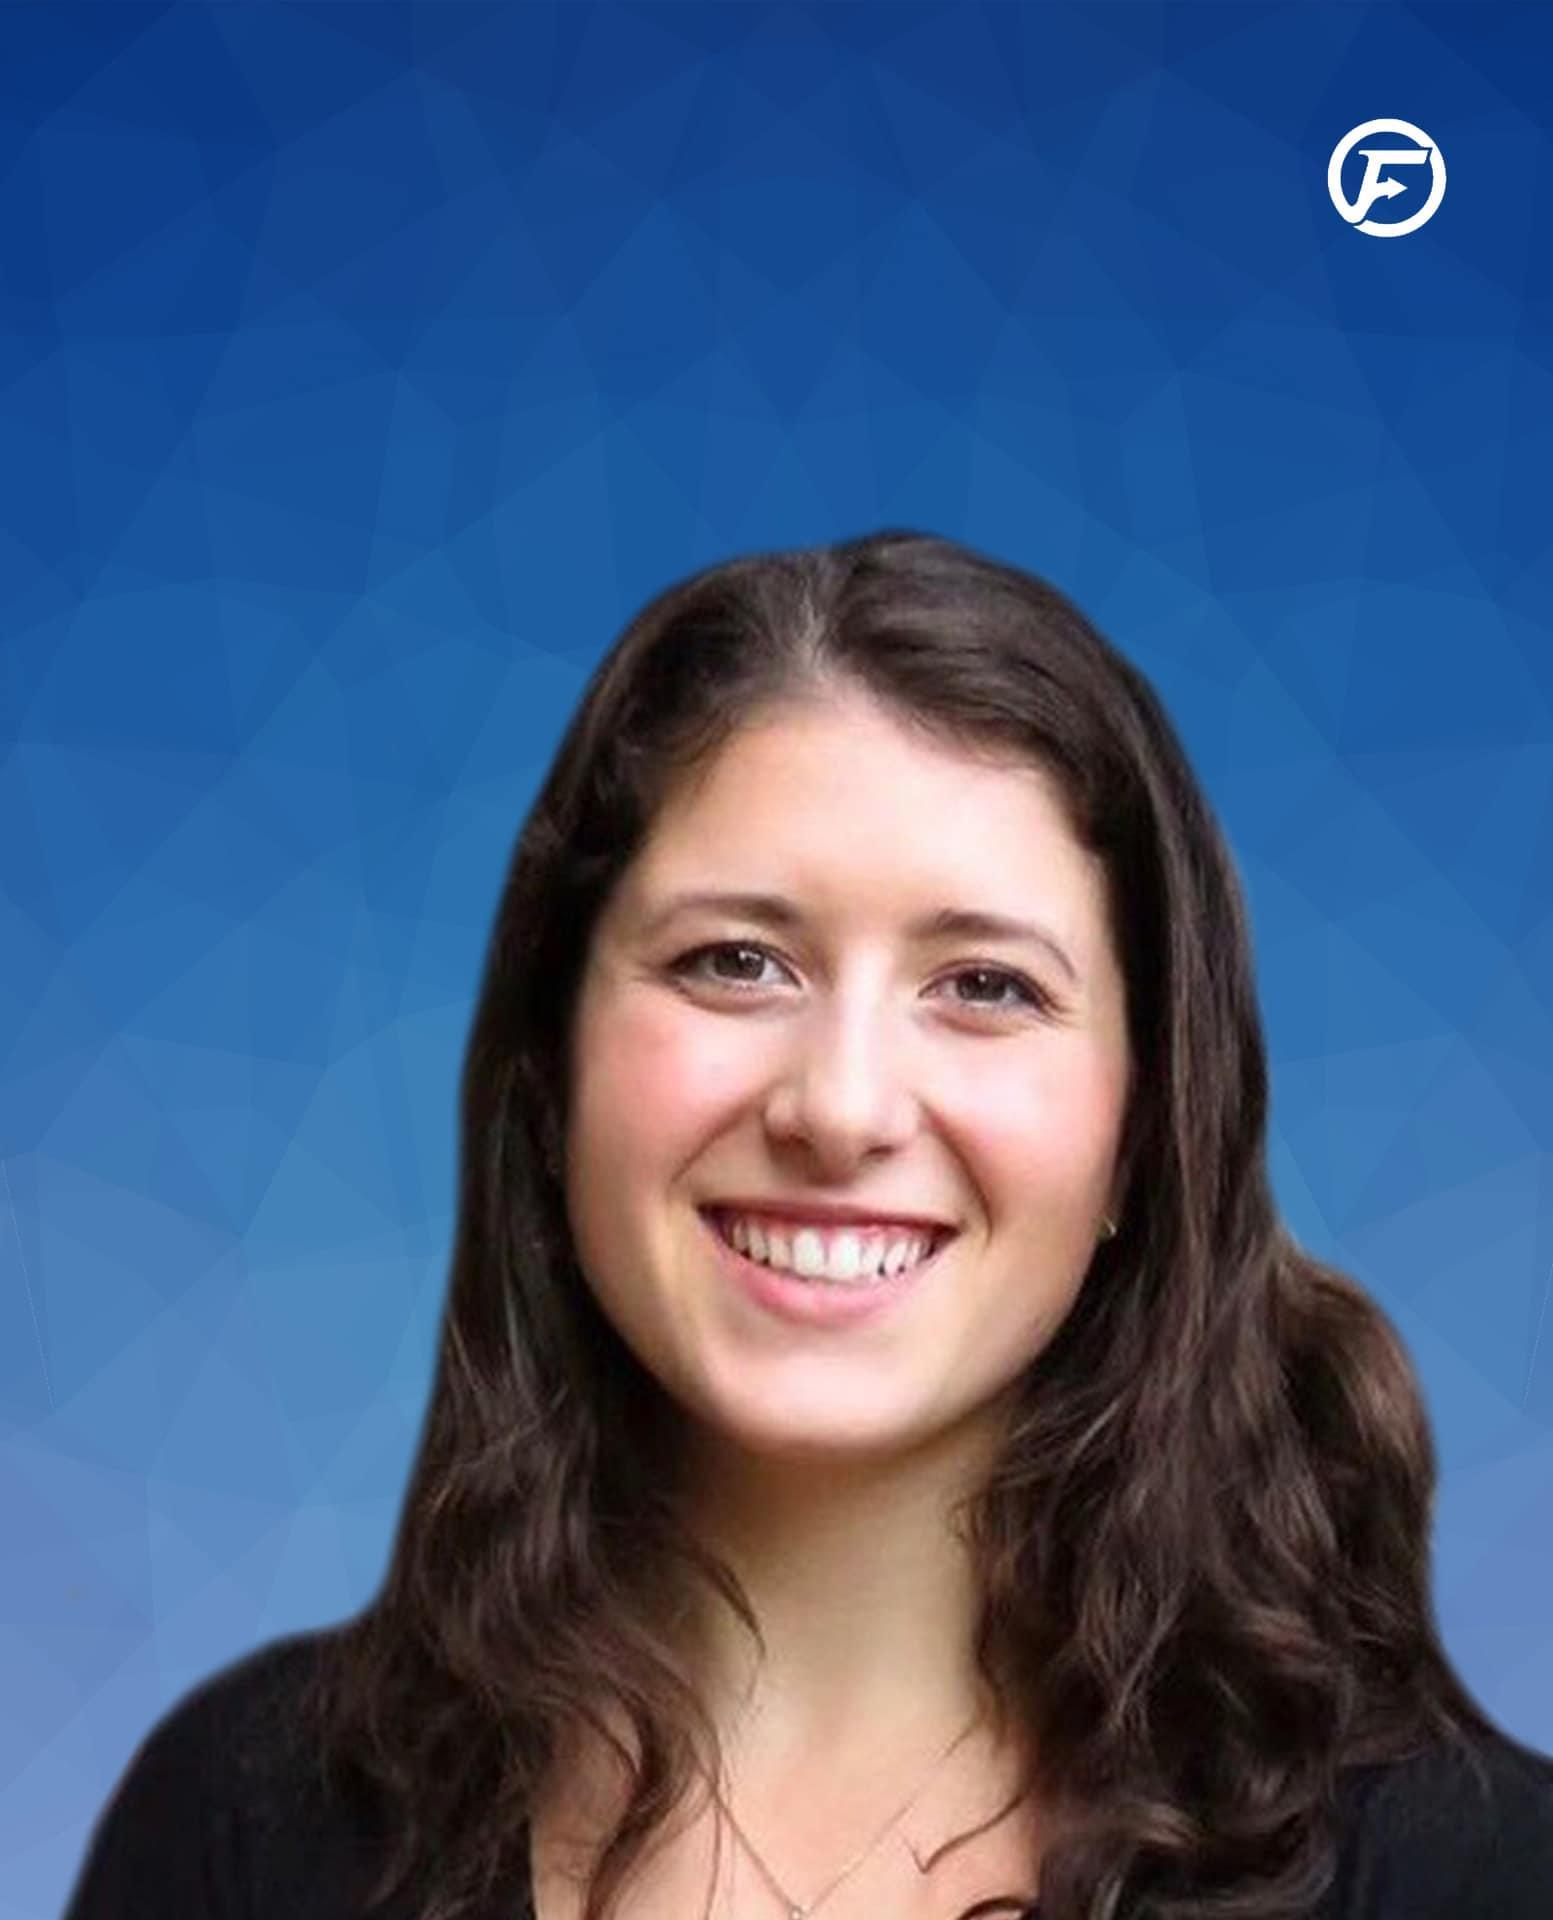 FLEX College Prep: College Counselor, ACT & SAT Prep